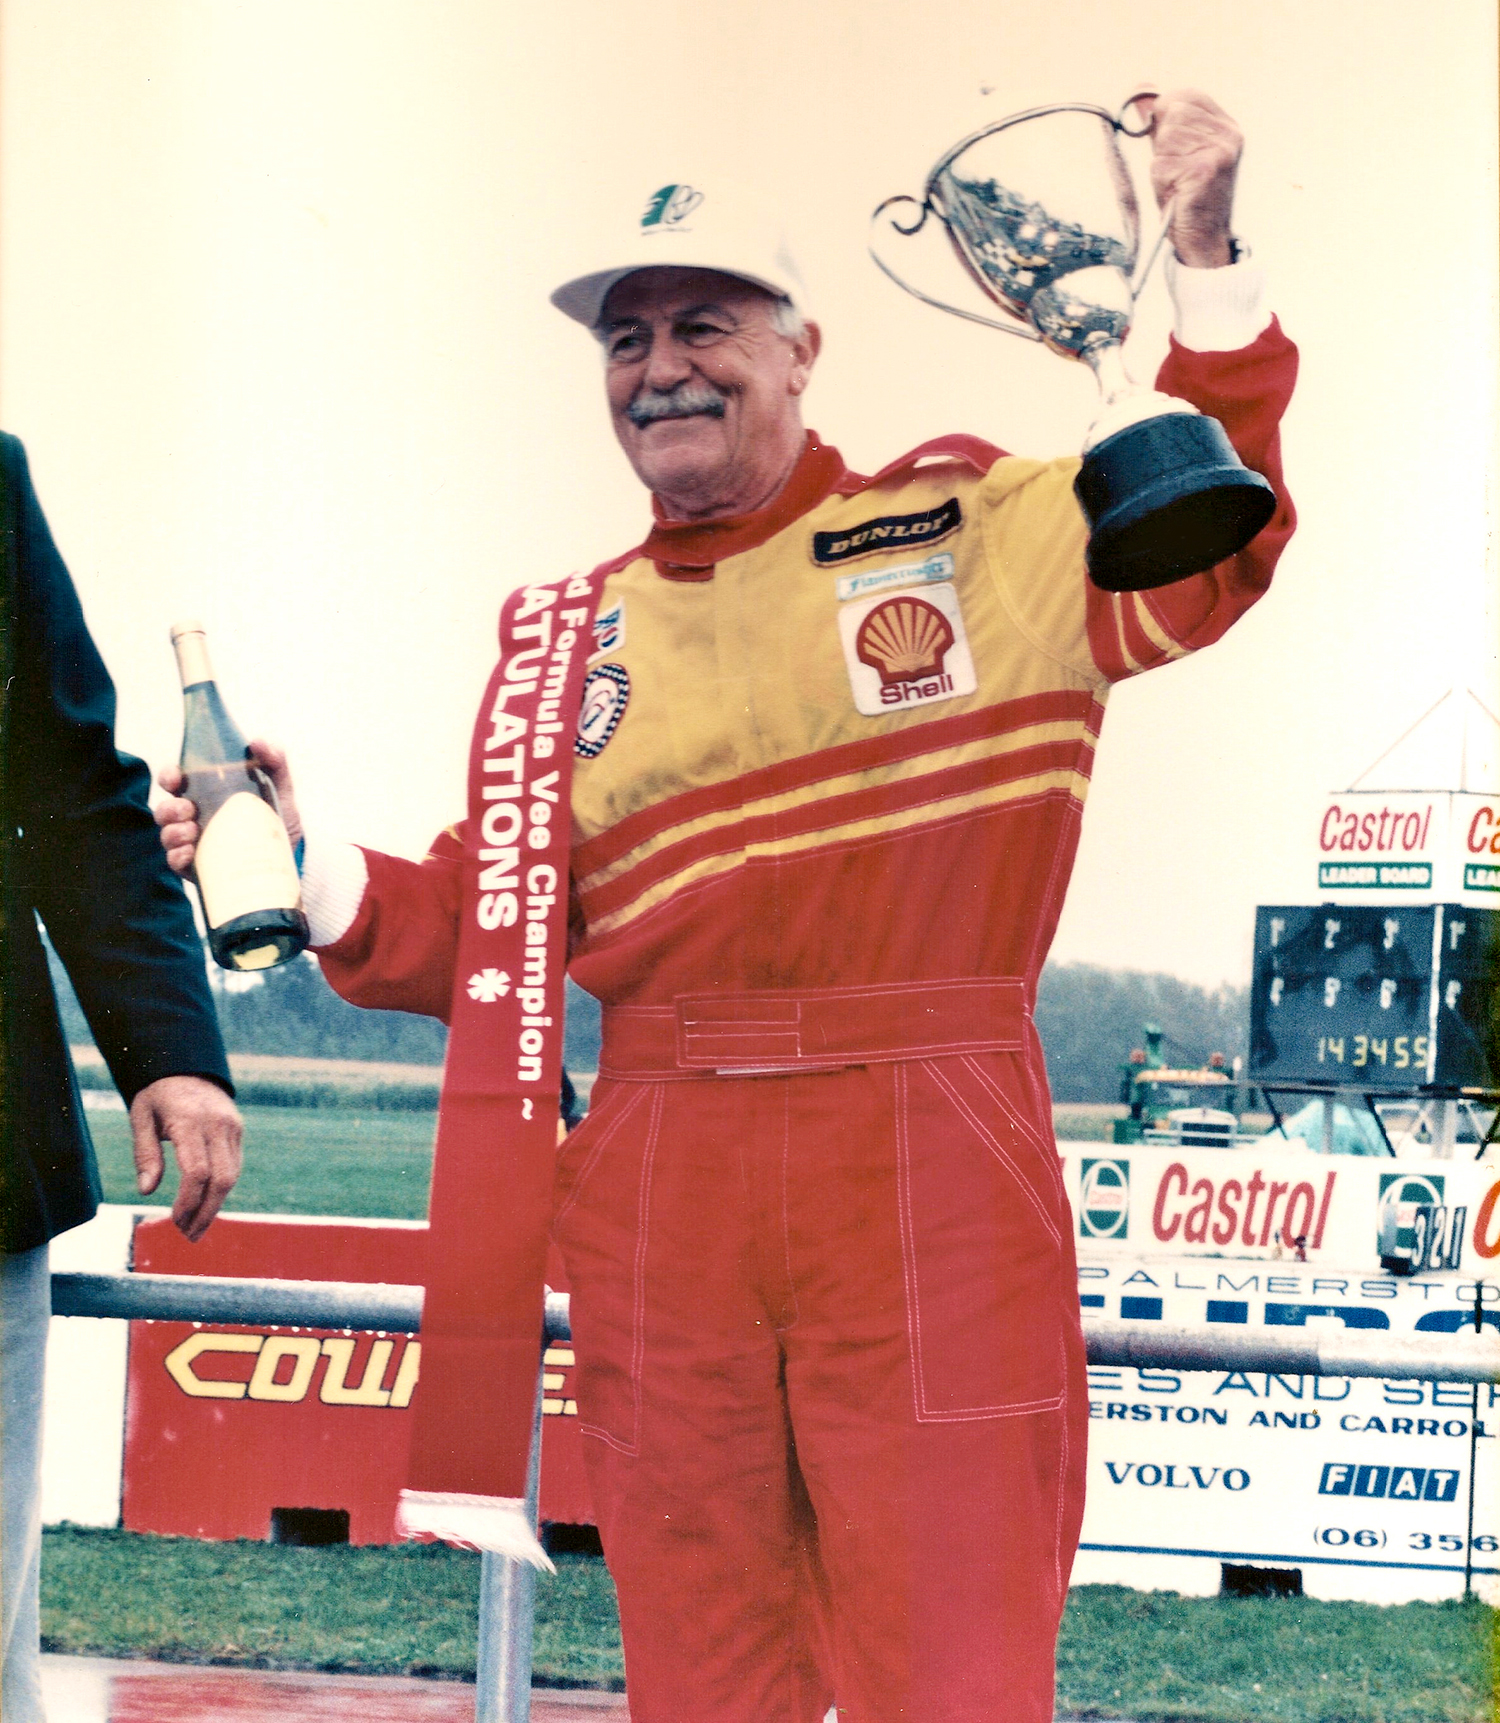 Rob Lester winning the 1995 NZ Formula Vee Championship